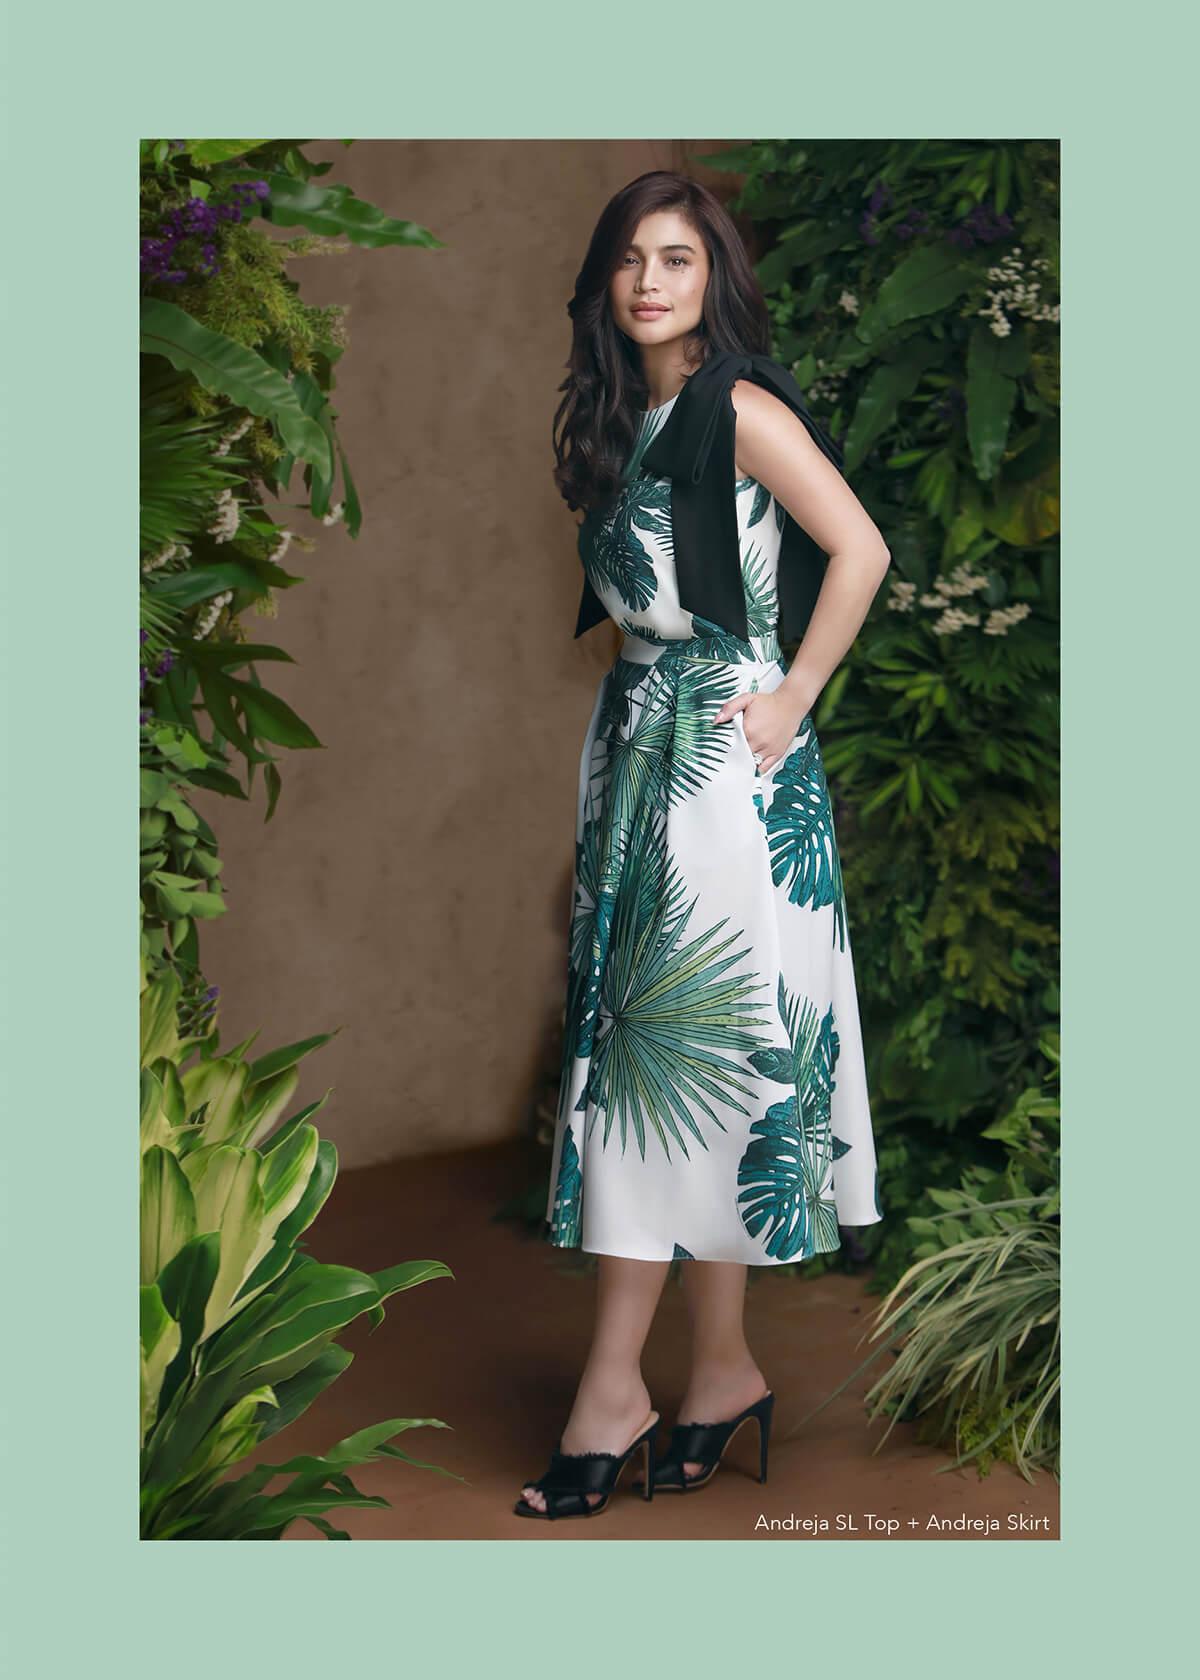 Plains & Prints Mark Bumgarner Collection - Andreia SL Top + Andreia Skirt